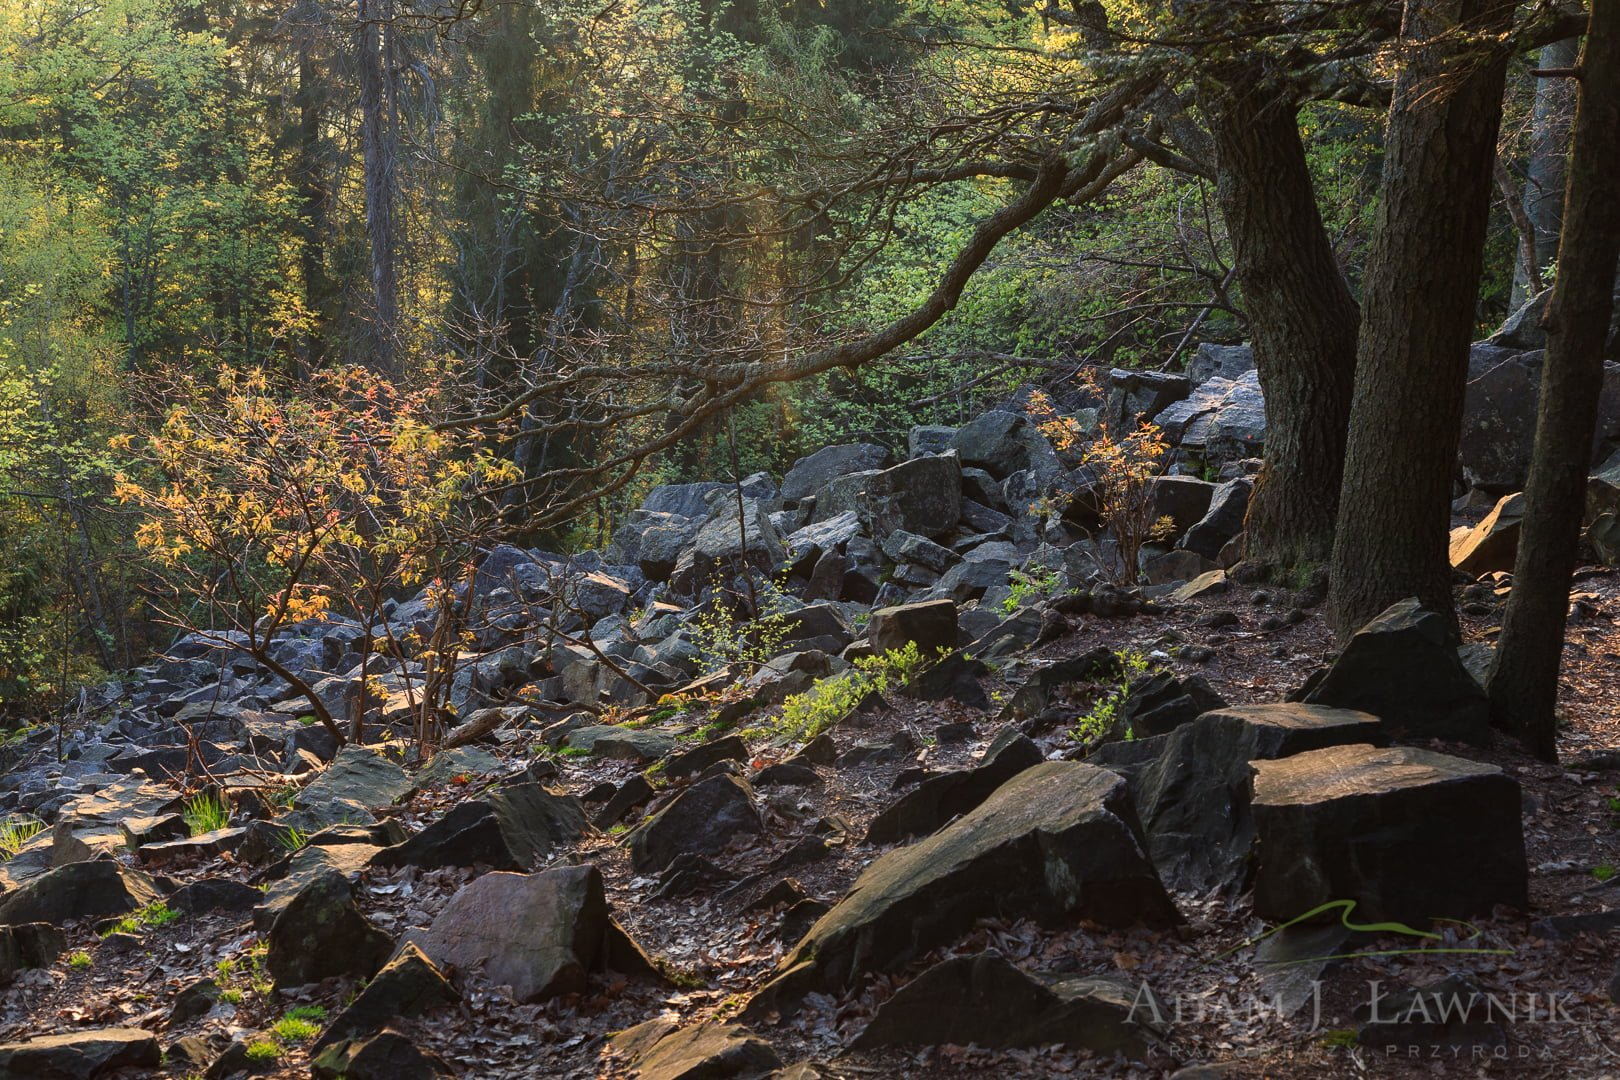 Świętokrzyski National Park, Poland 0805-00178C